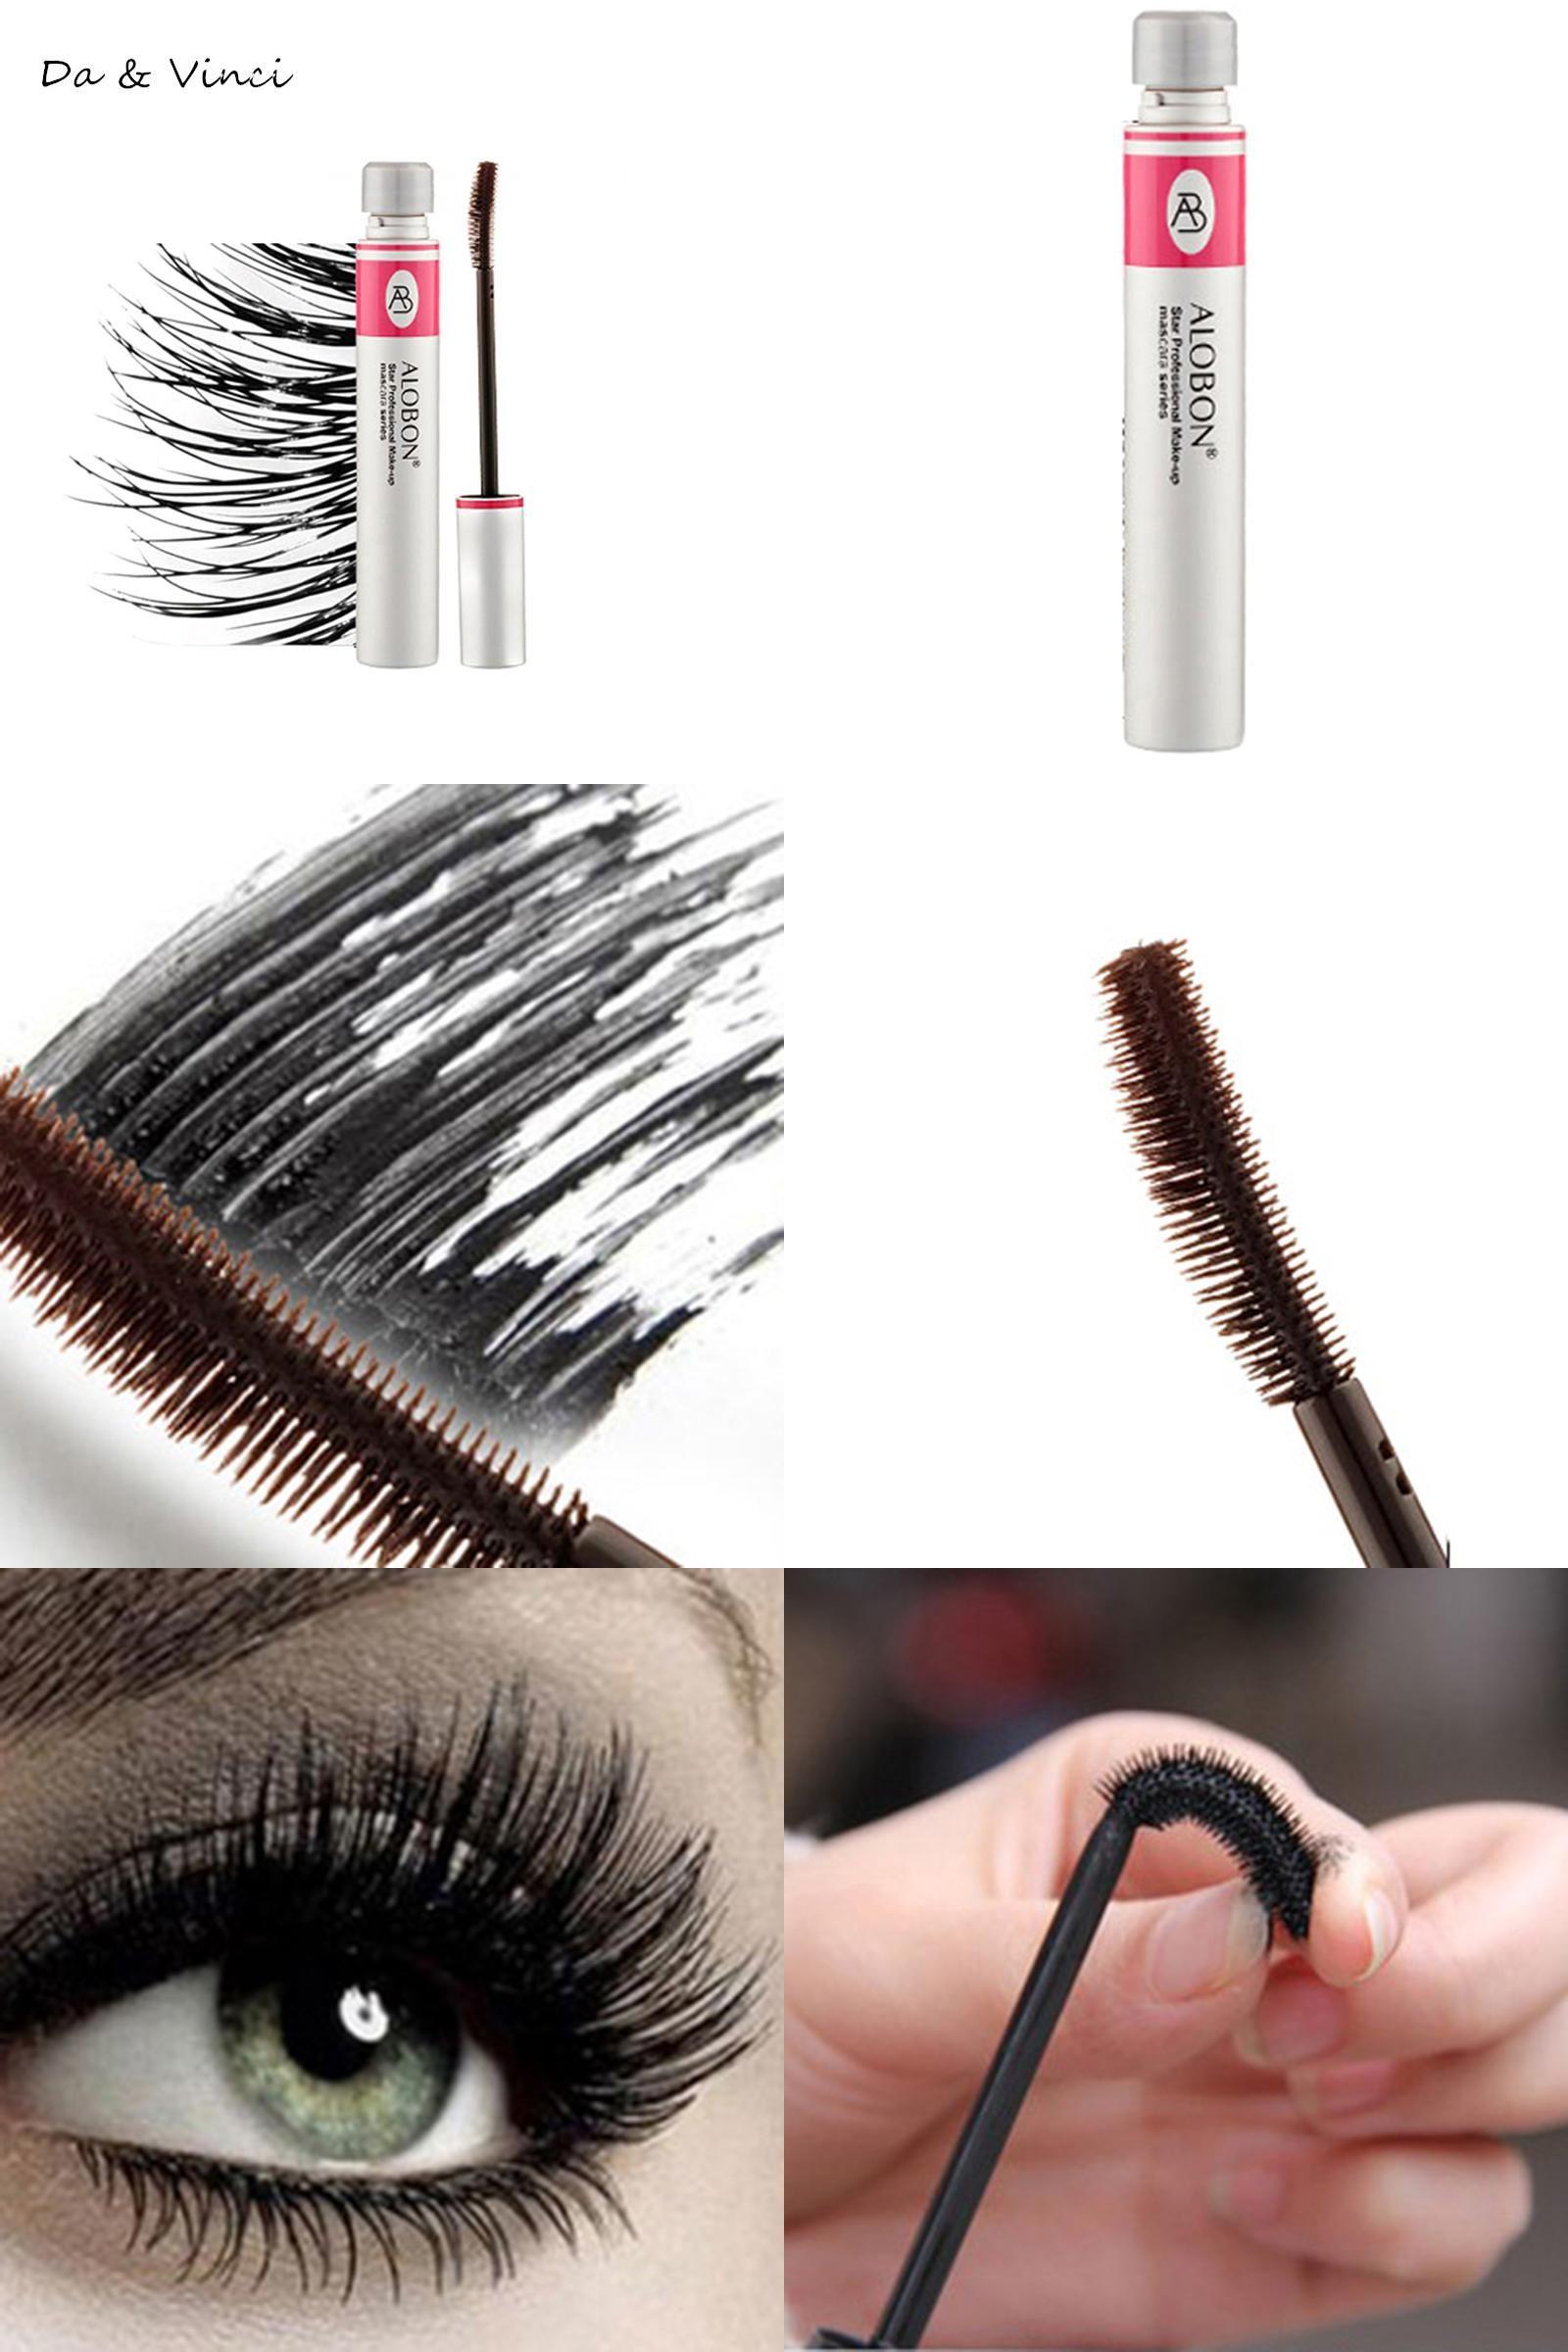 3c3c1e21323 [Visit to Buy] Eyelashes Lengthening Extension Colossal Volume Mascara  Black Ink Alobon 3d Fiber